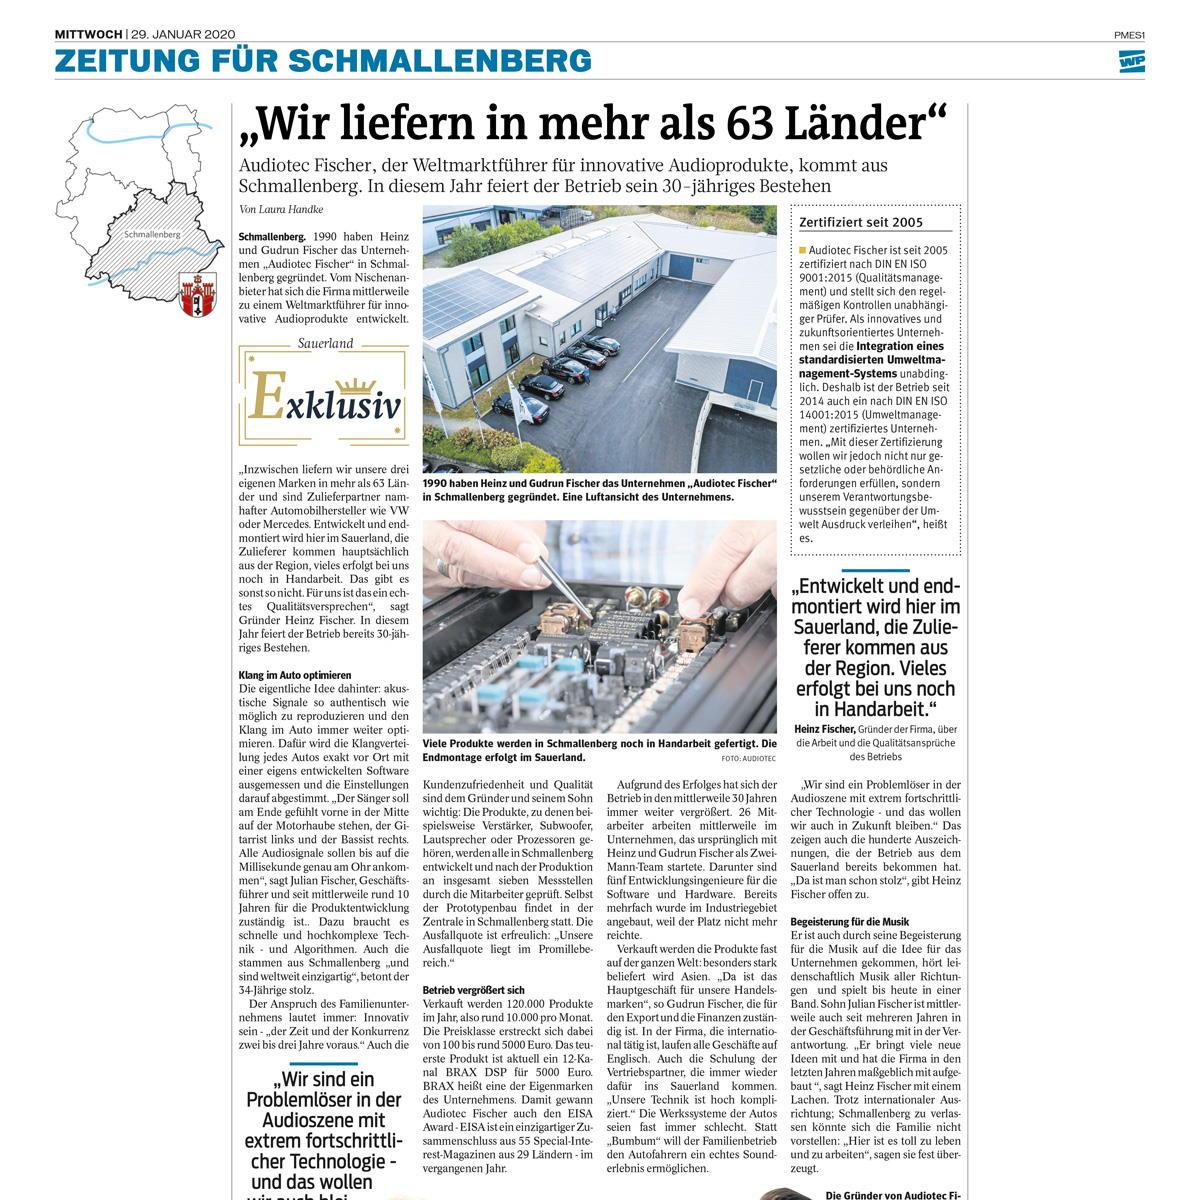 Westfalenpost-2020_02_29-Firmenportrait-ATFP3LCXJdDaNE4H-pagespeed-ce-nExfq2jYHI